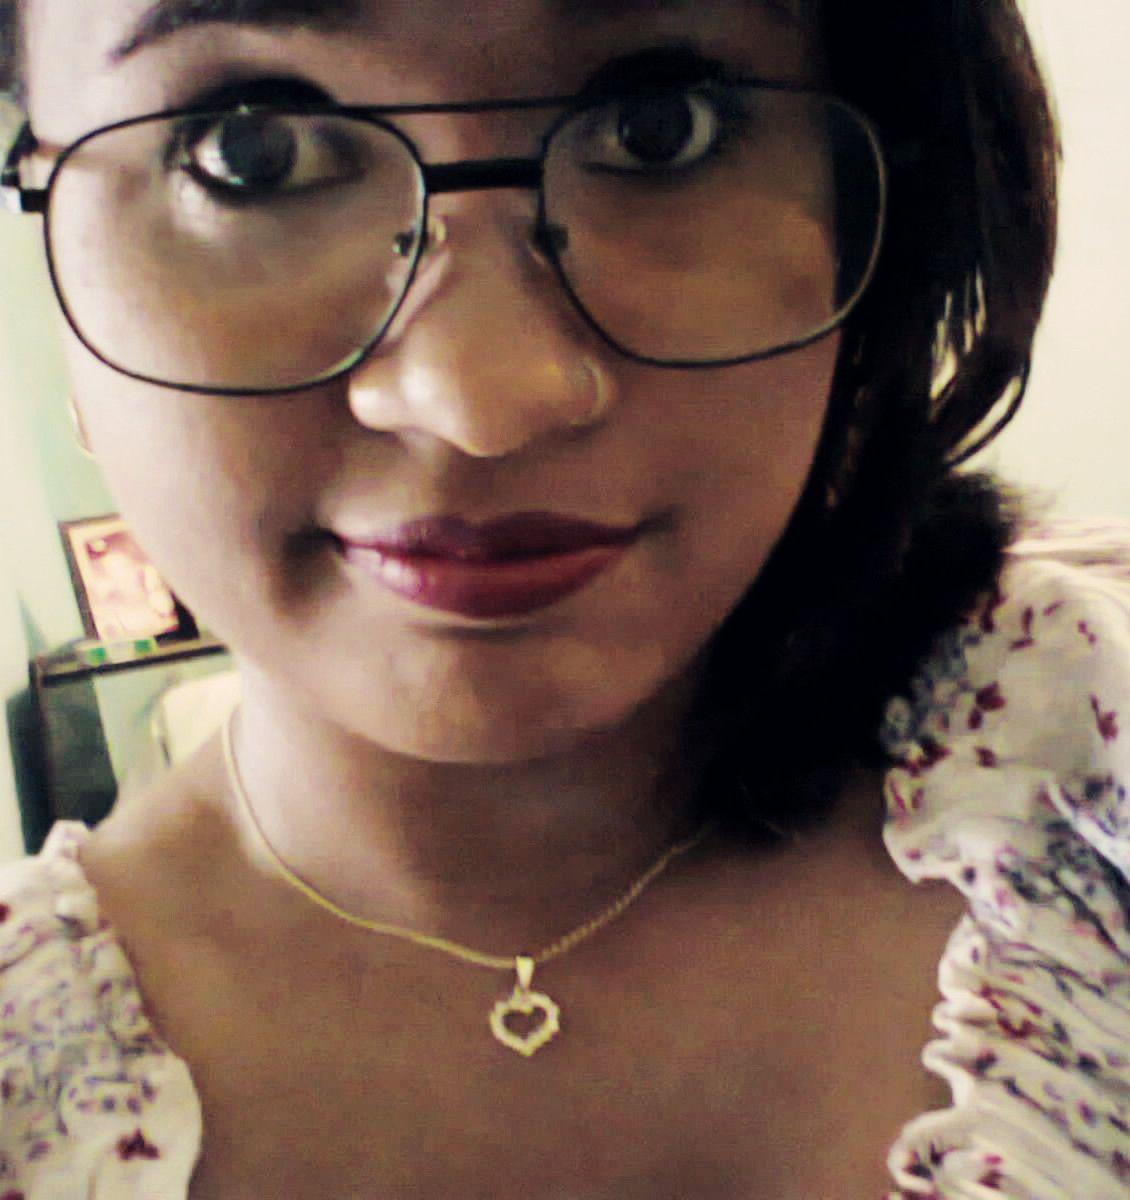 Óculos tapando  cara? Adoro *.*